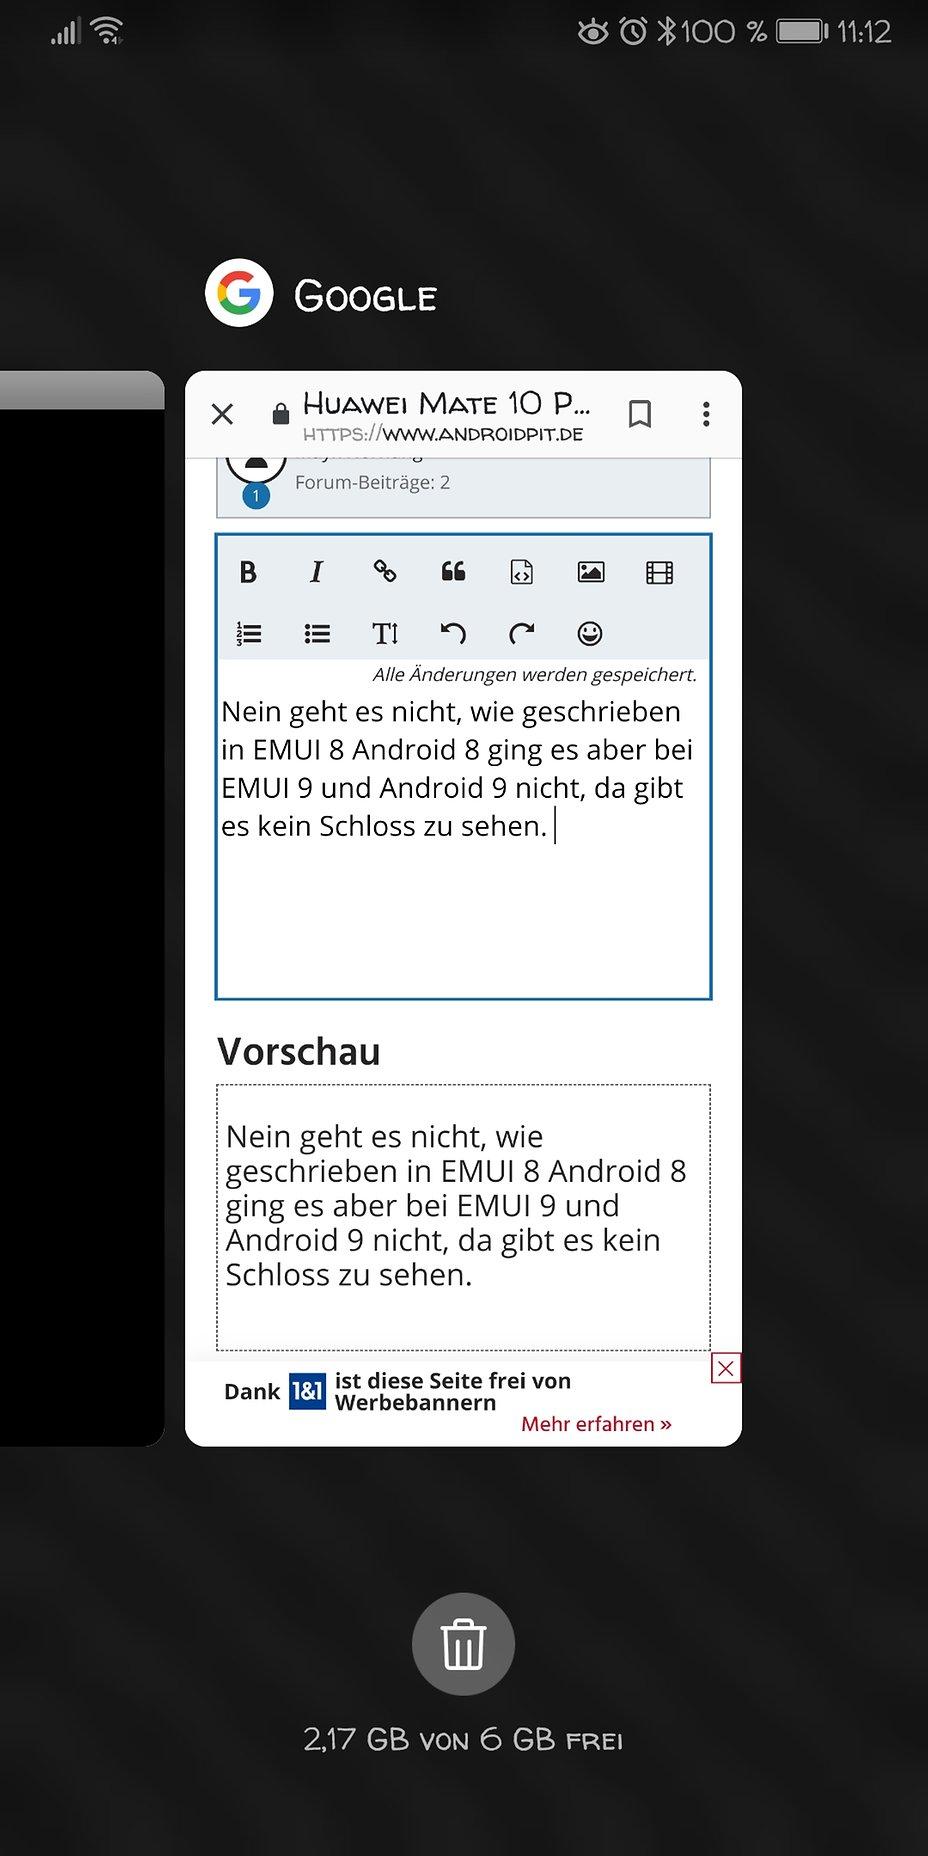 Huawei Mate 10 Pro — Task Manager, Apps geöffnet lassen